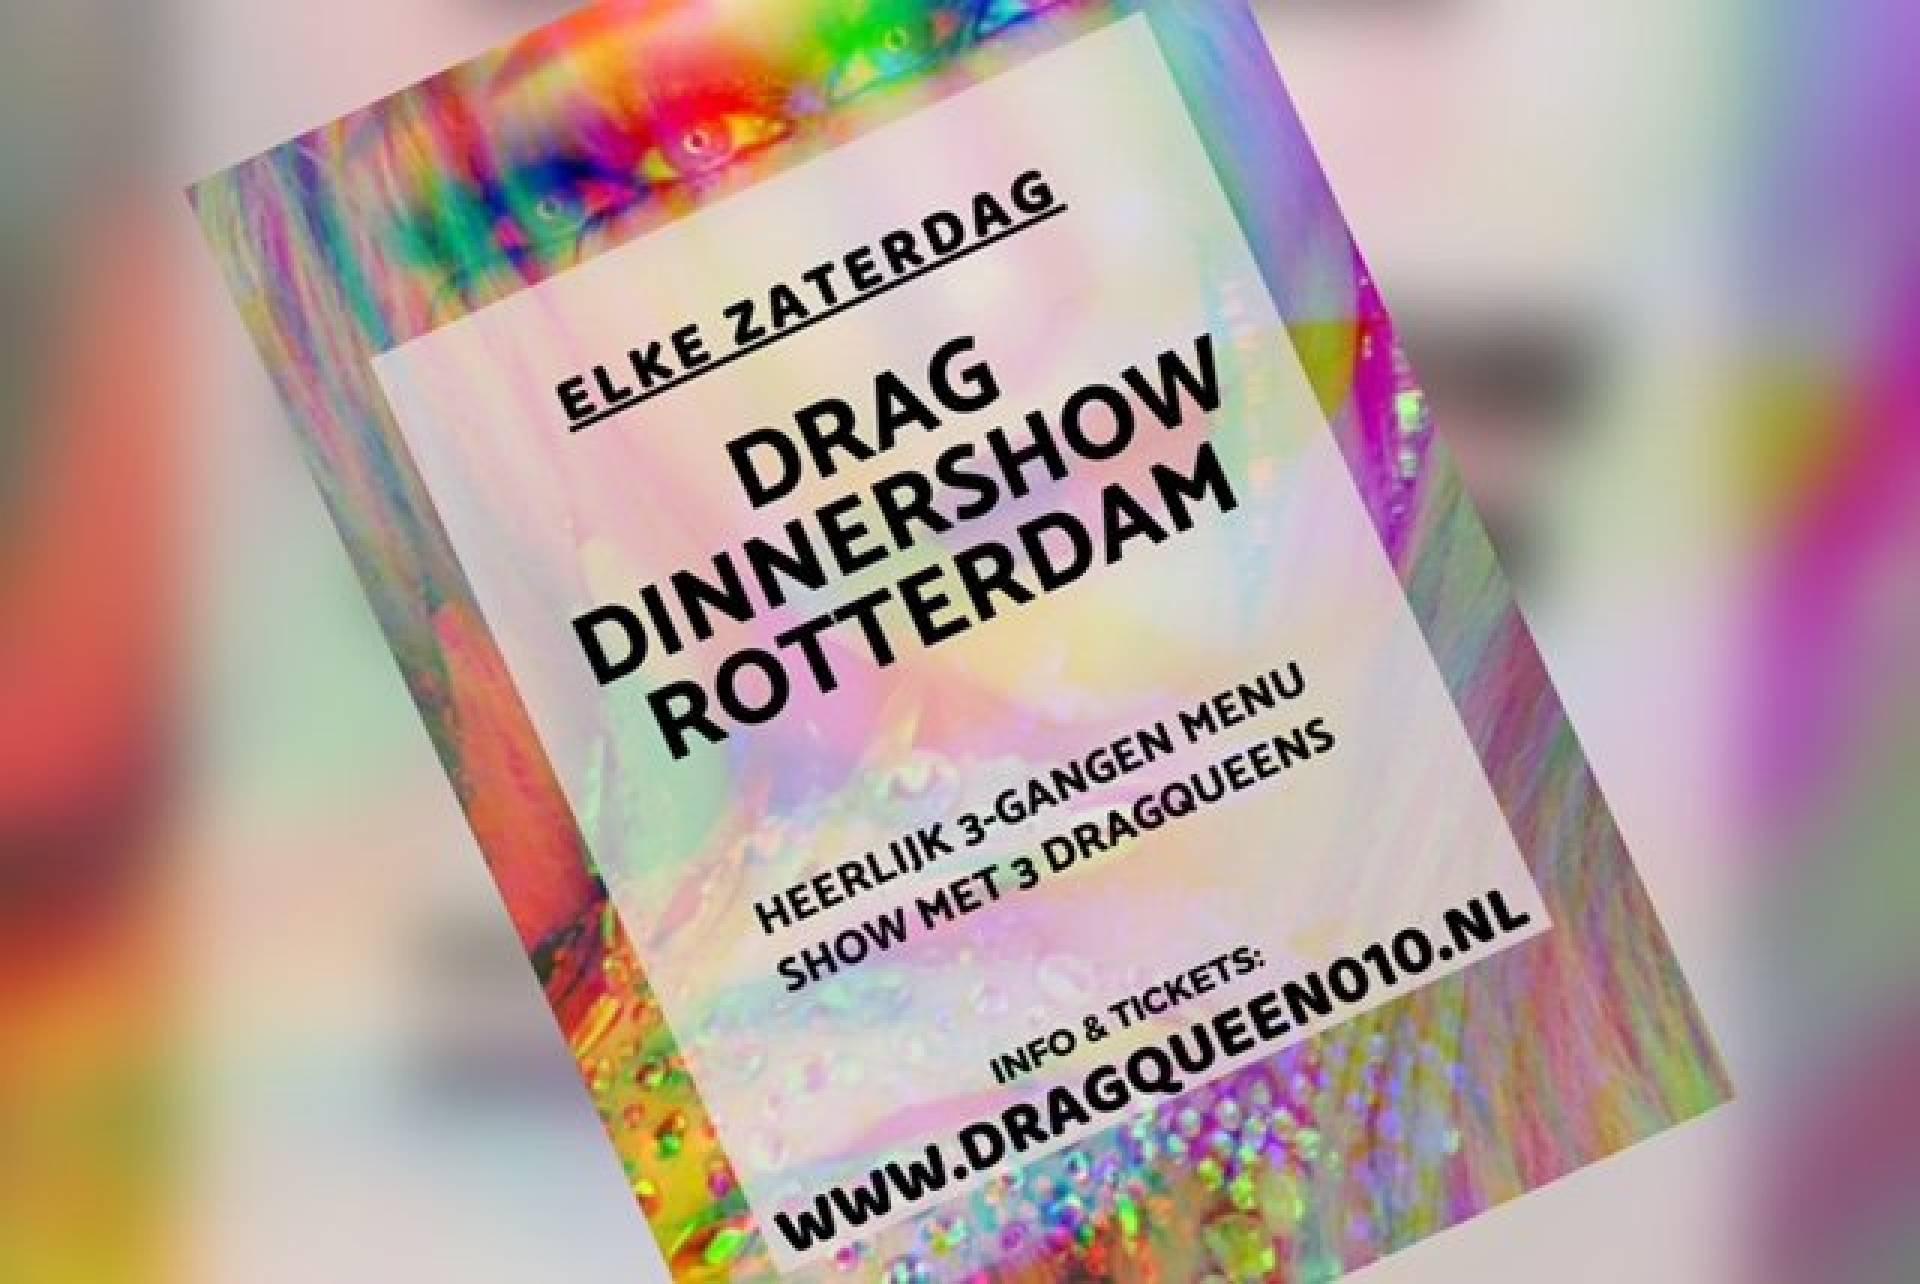 Drag Dinner Show Rotterdam Q3